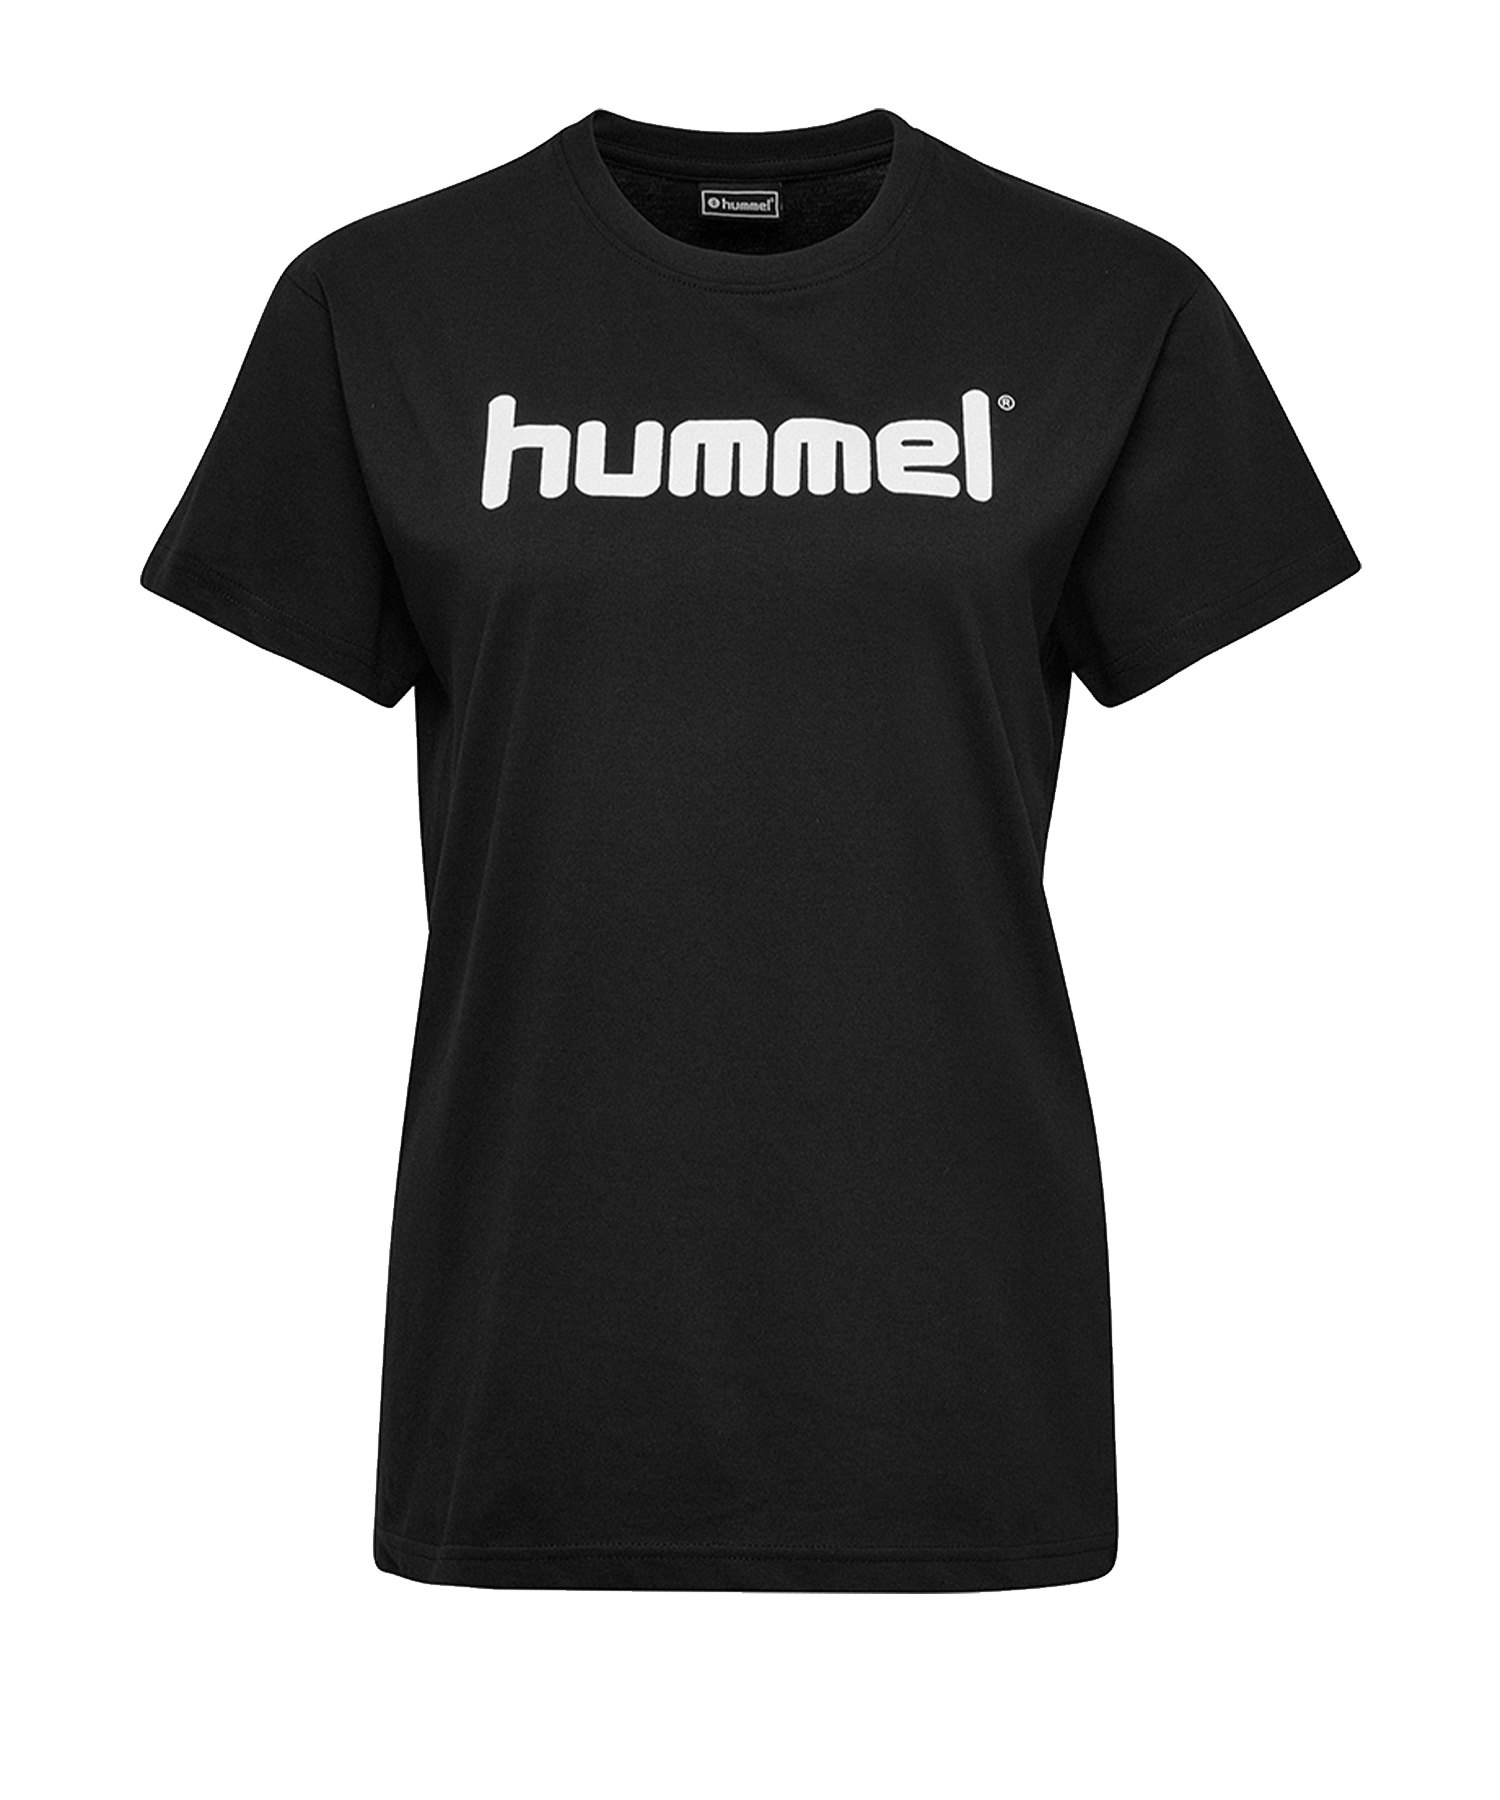 Hummel Cotton T-Shirt Logo Damen Schwarz F2001 - Schwarz